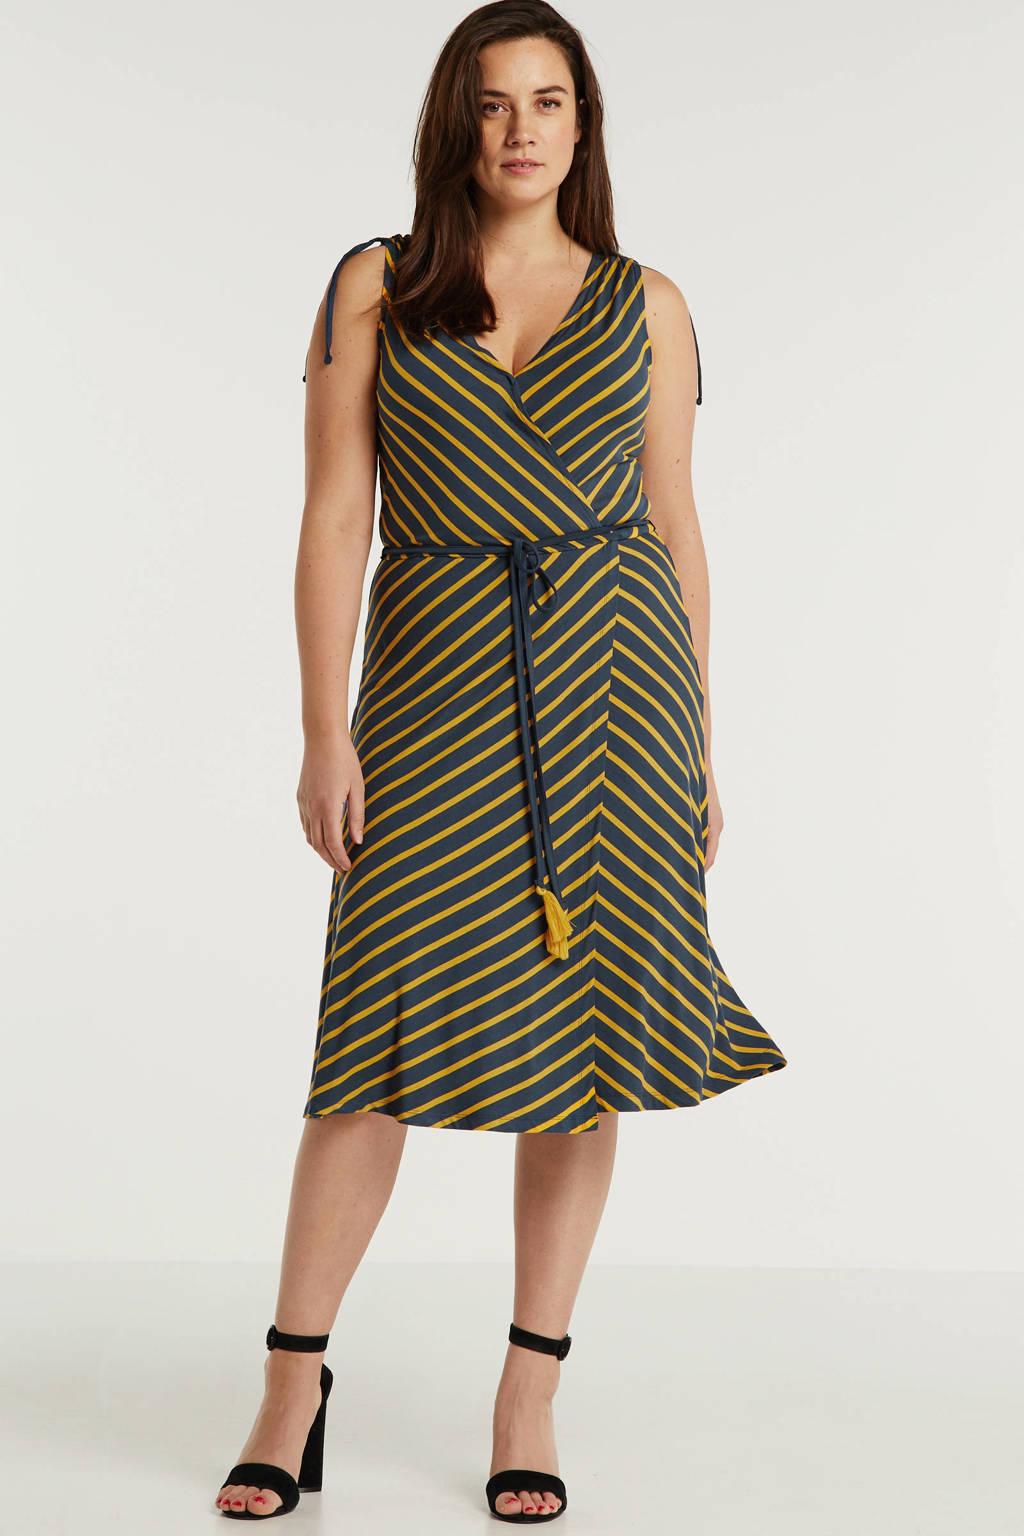 anytime wikkel-look jurk Plus size blauw/okergeel, Blauw/okergeel